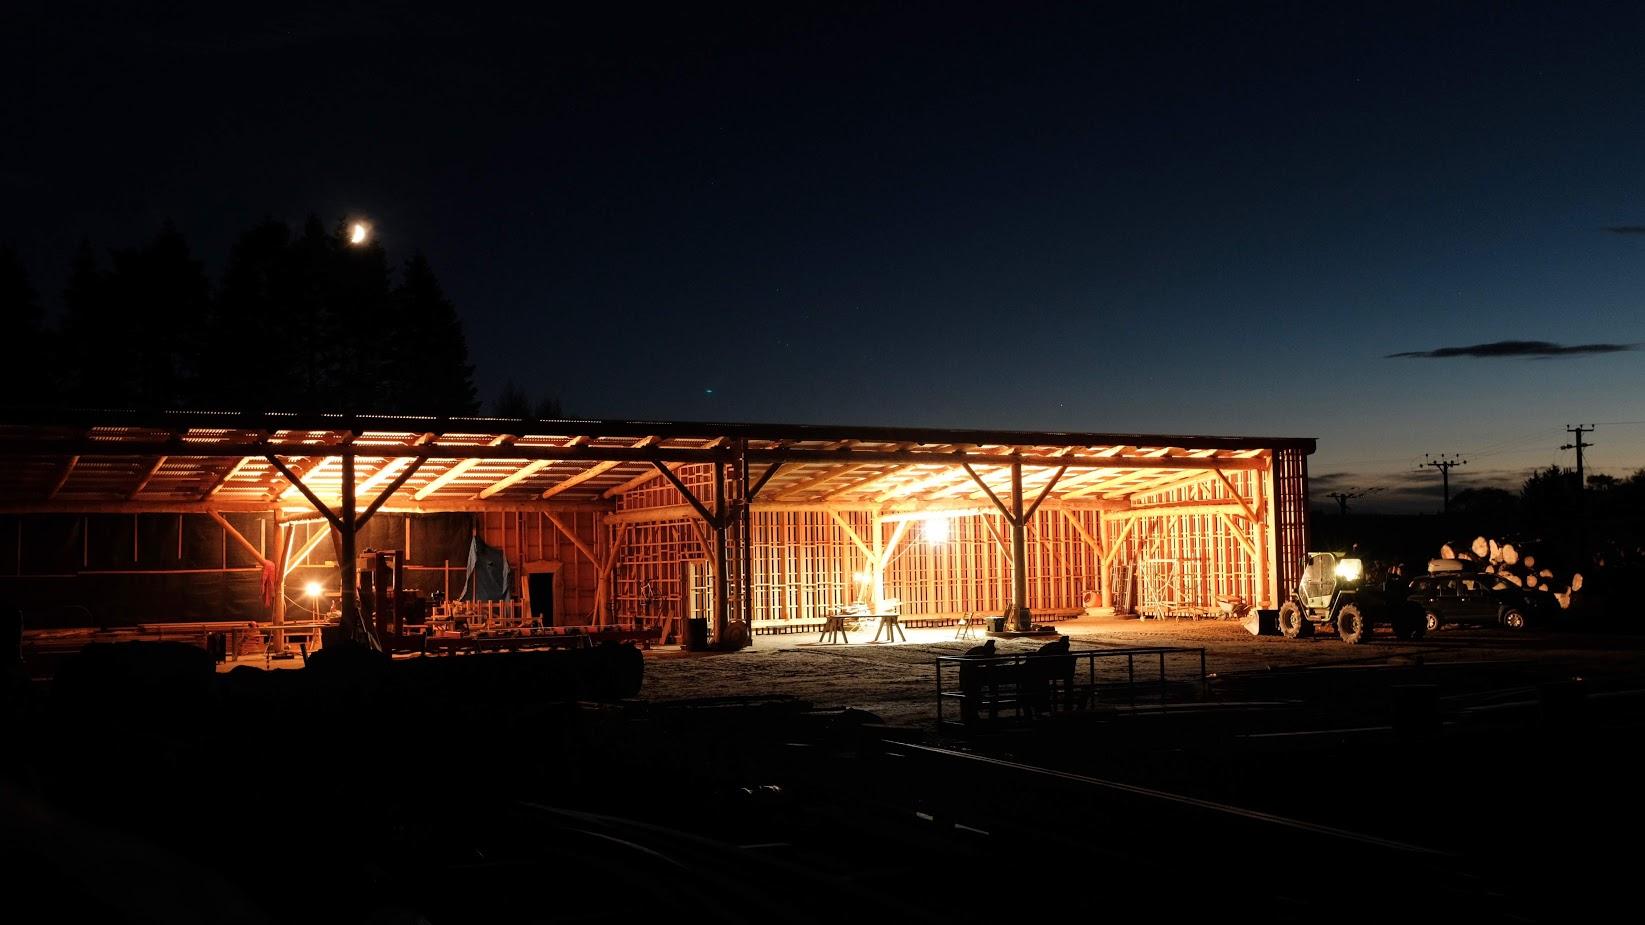 Logie Timber Sawmill Shed